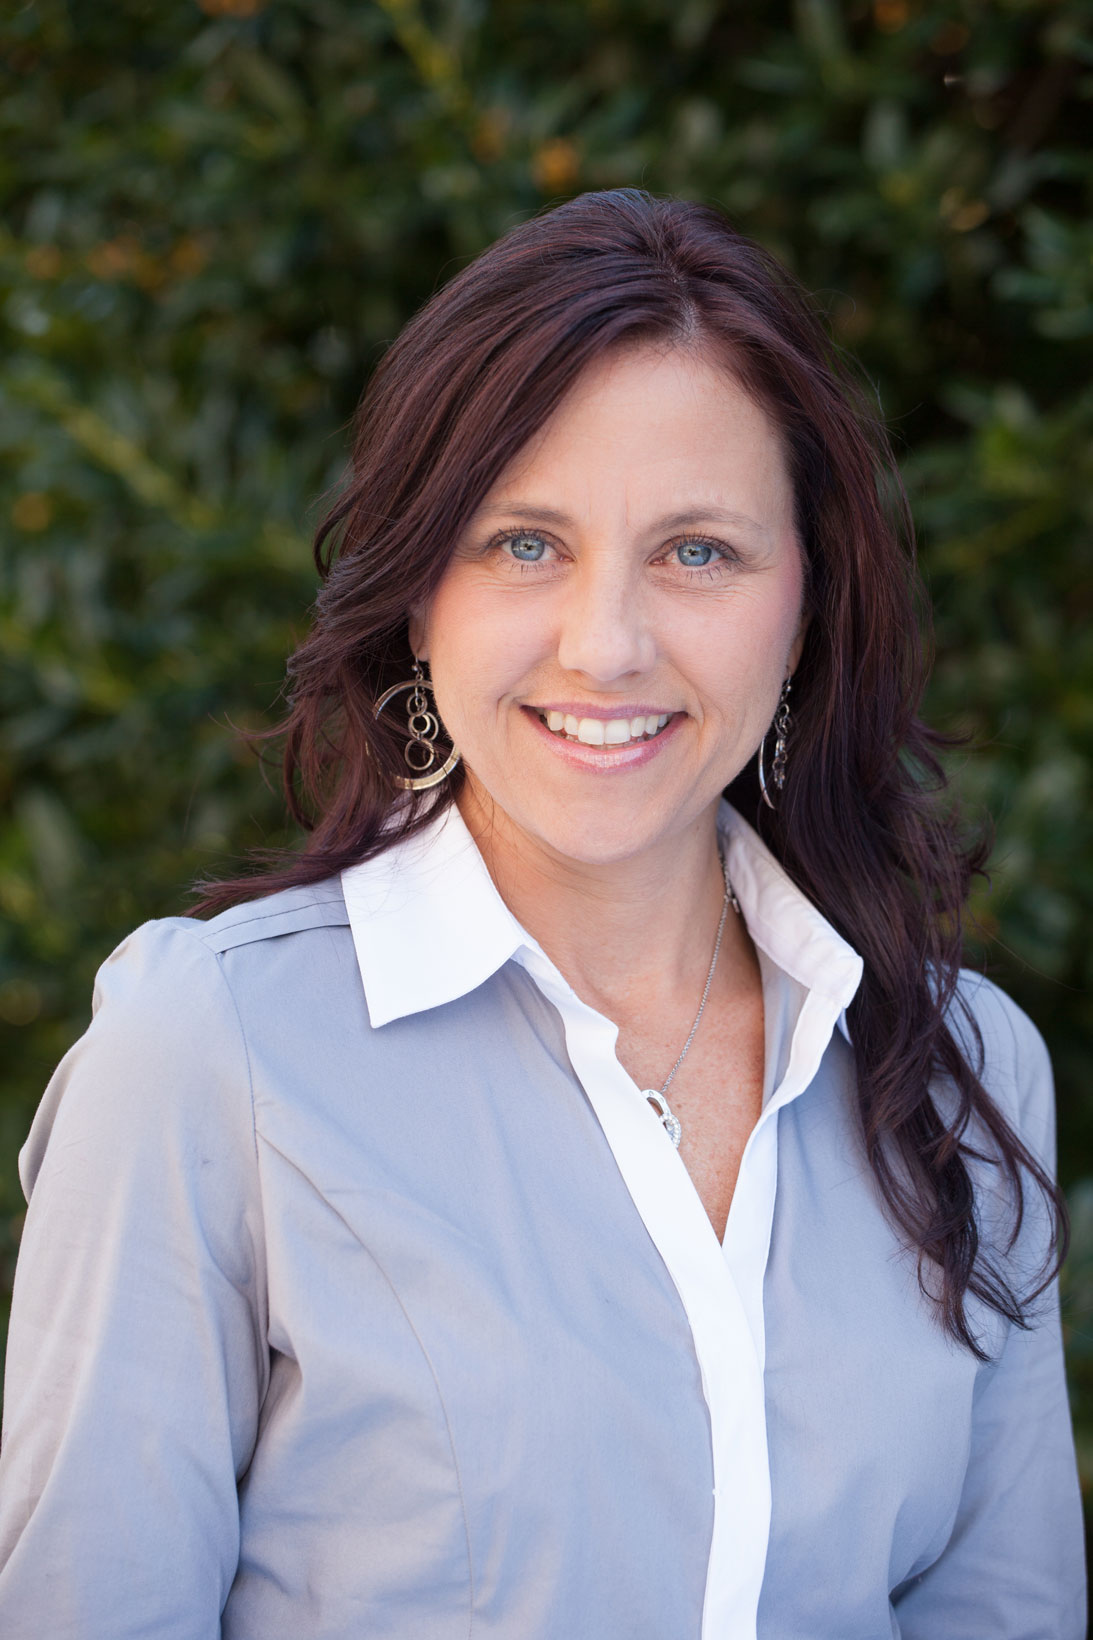 Photo of Jodi Monroe, Business Development Specialist